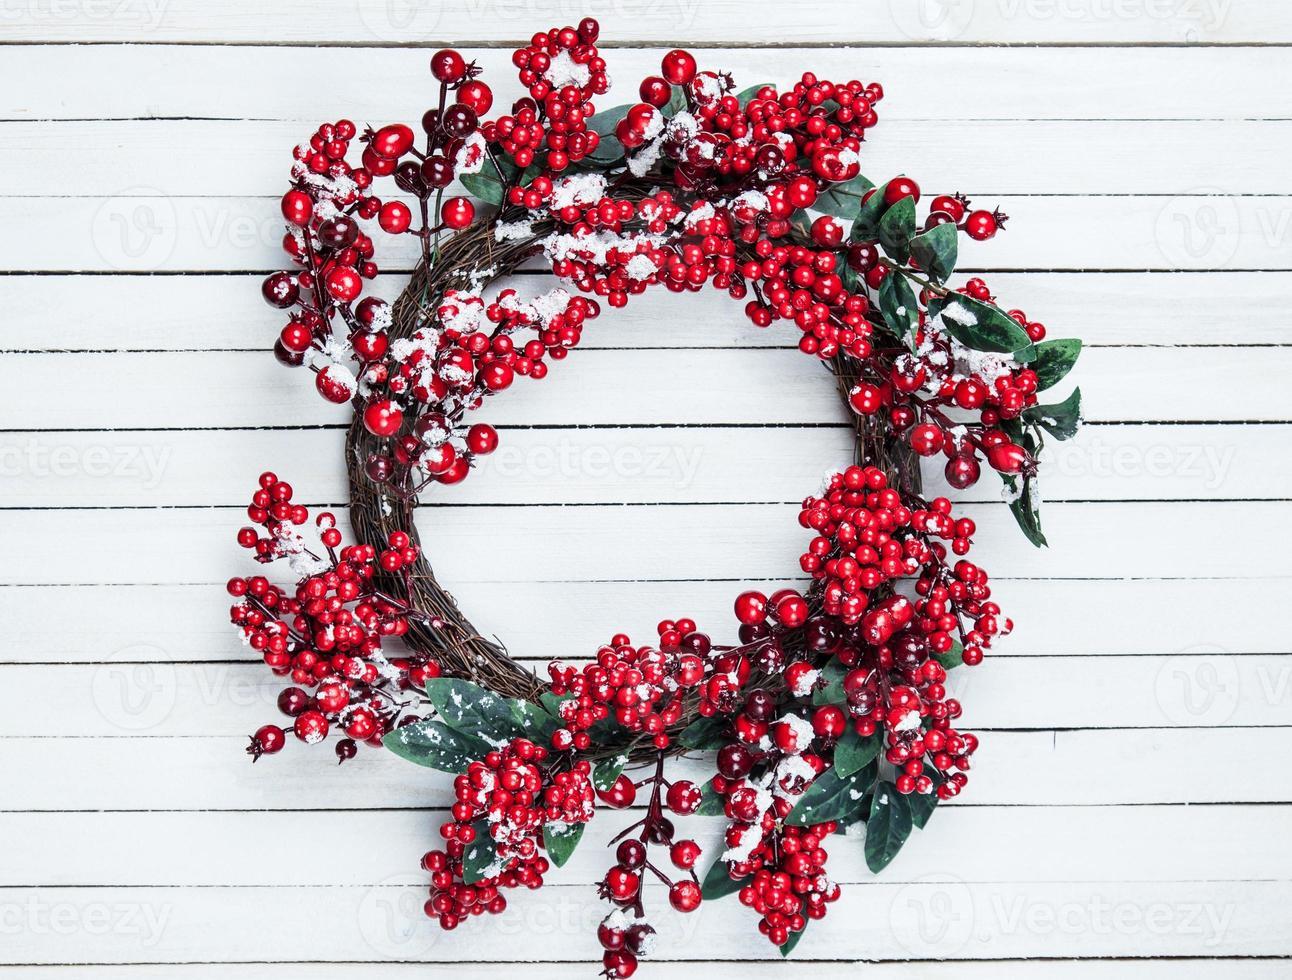 corona de navidad sobre un fondo de madera foto